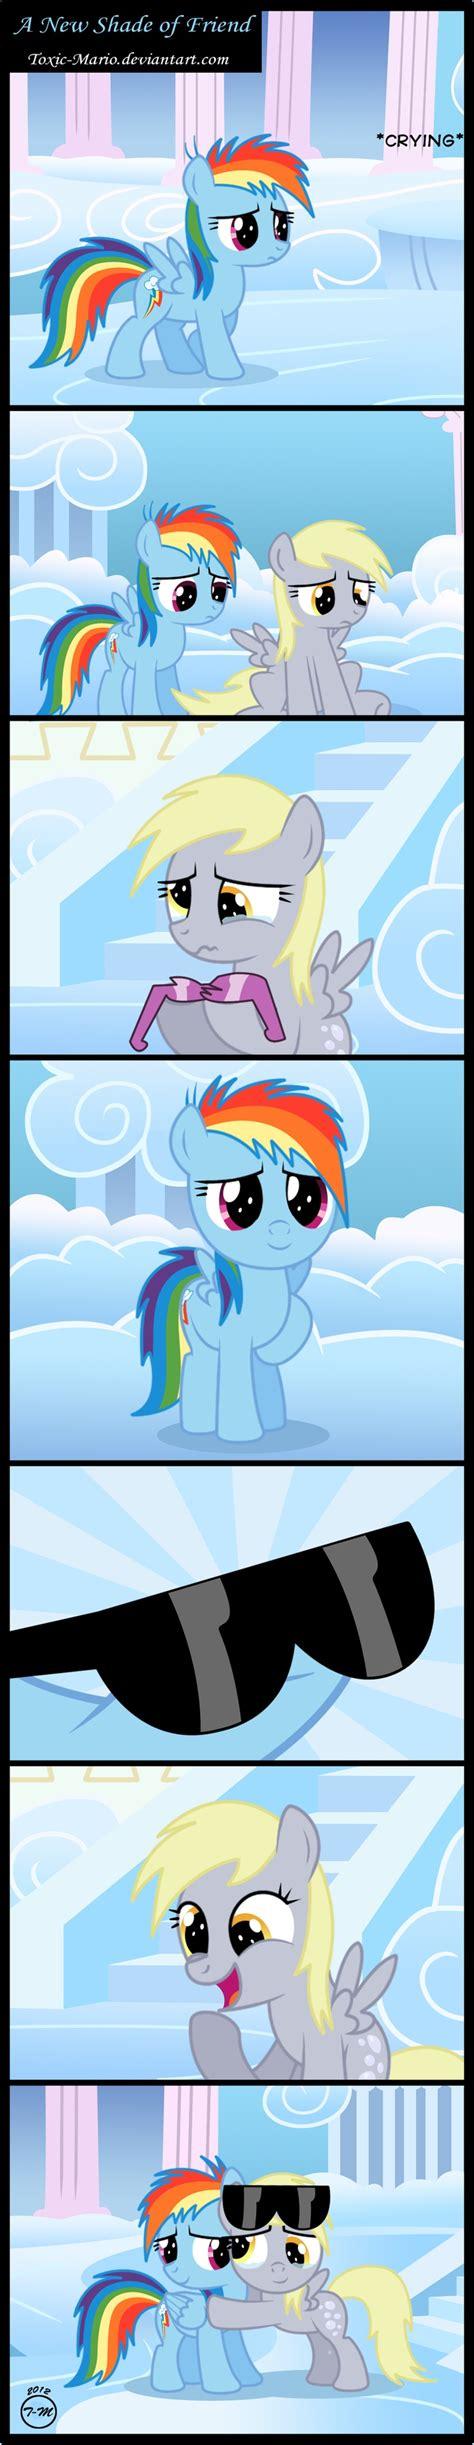 Bgc My Pinkie Pony Rainbow Dash And Friends Kantung Depan Tas R rainbow dash and derpy hooves bronymate brony mate brony bronies bronymate